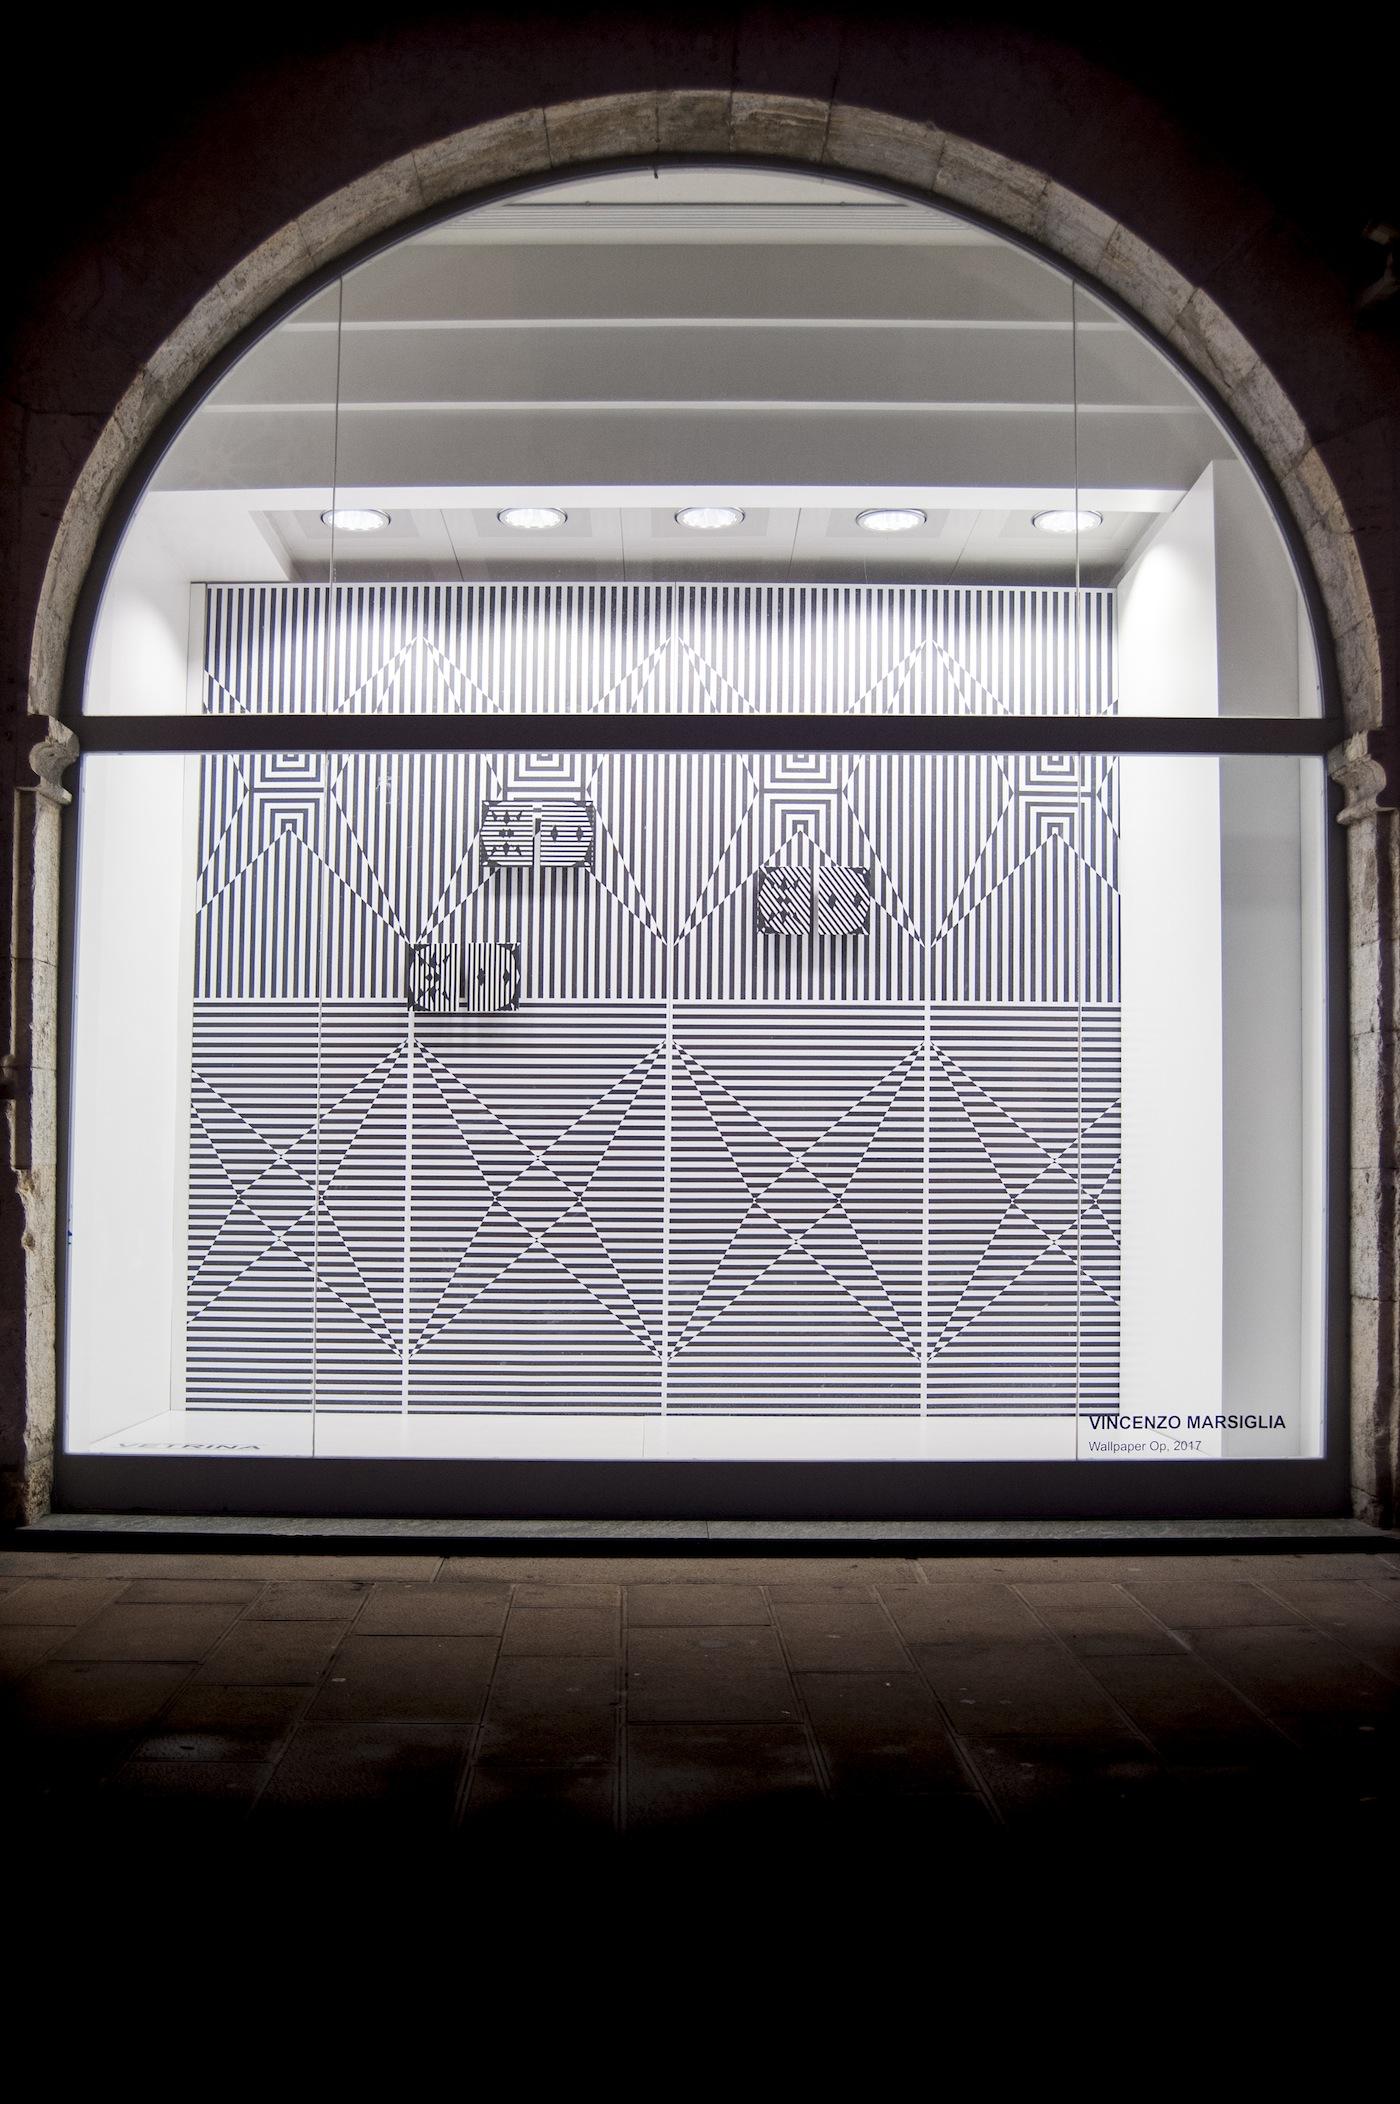 VINCENZO MARSIGLIA, Wallpaper Op, 2017 VETRINA - Pietrasanta Banco BPM - Vehicle Projects. Foto: Silvio Pennesi